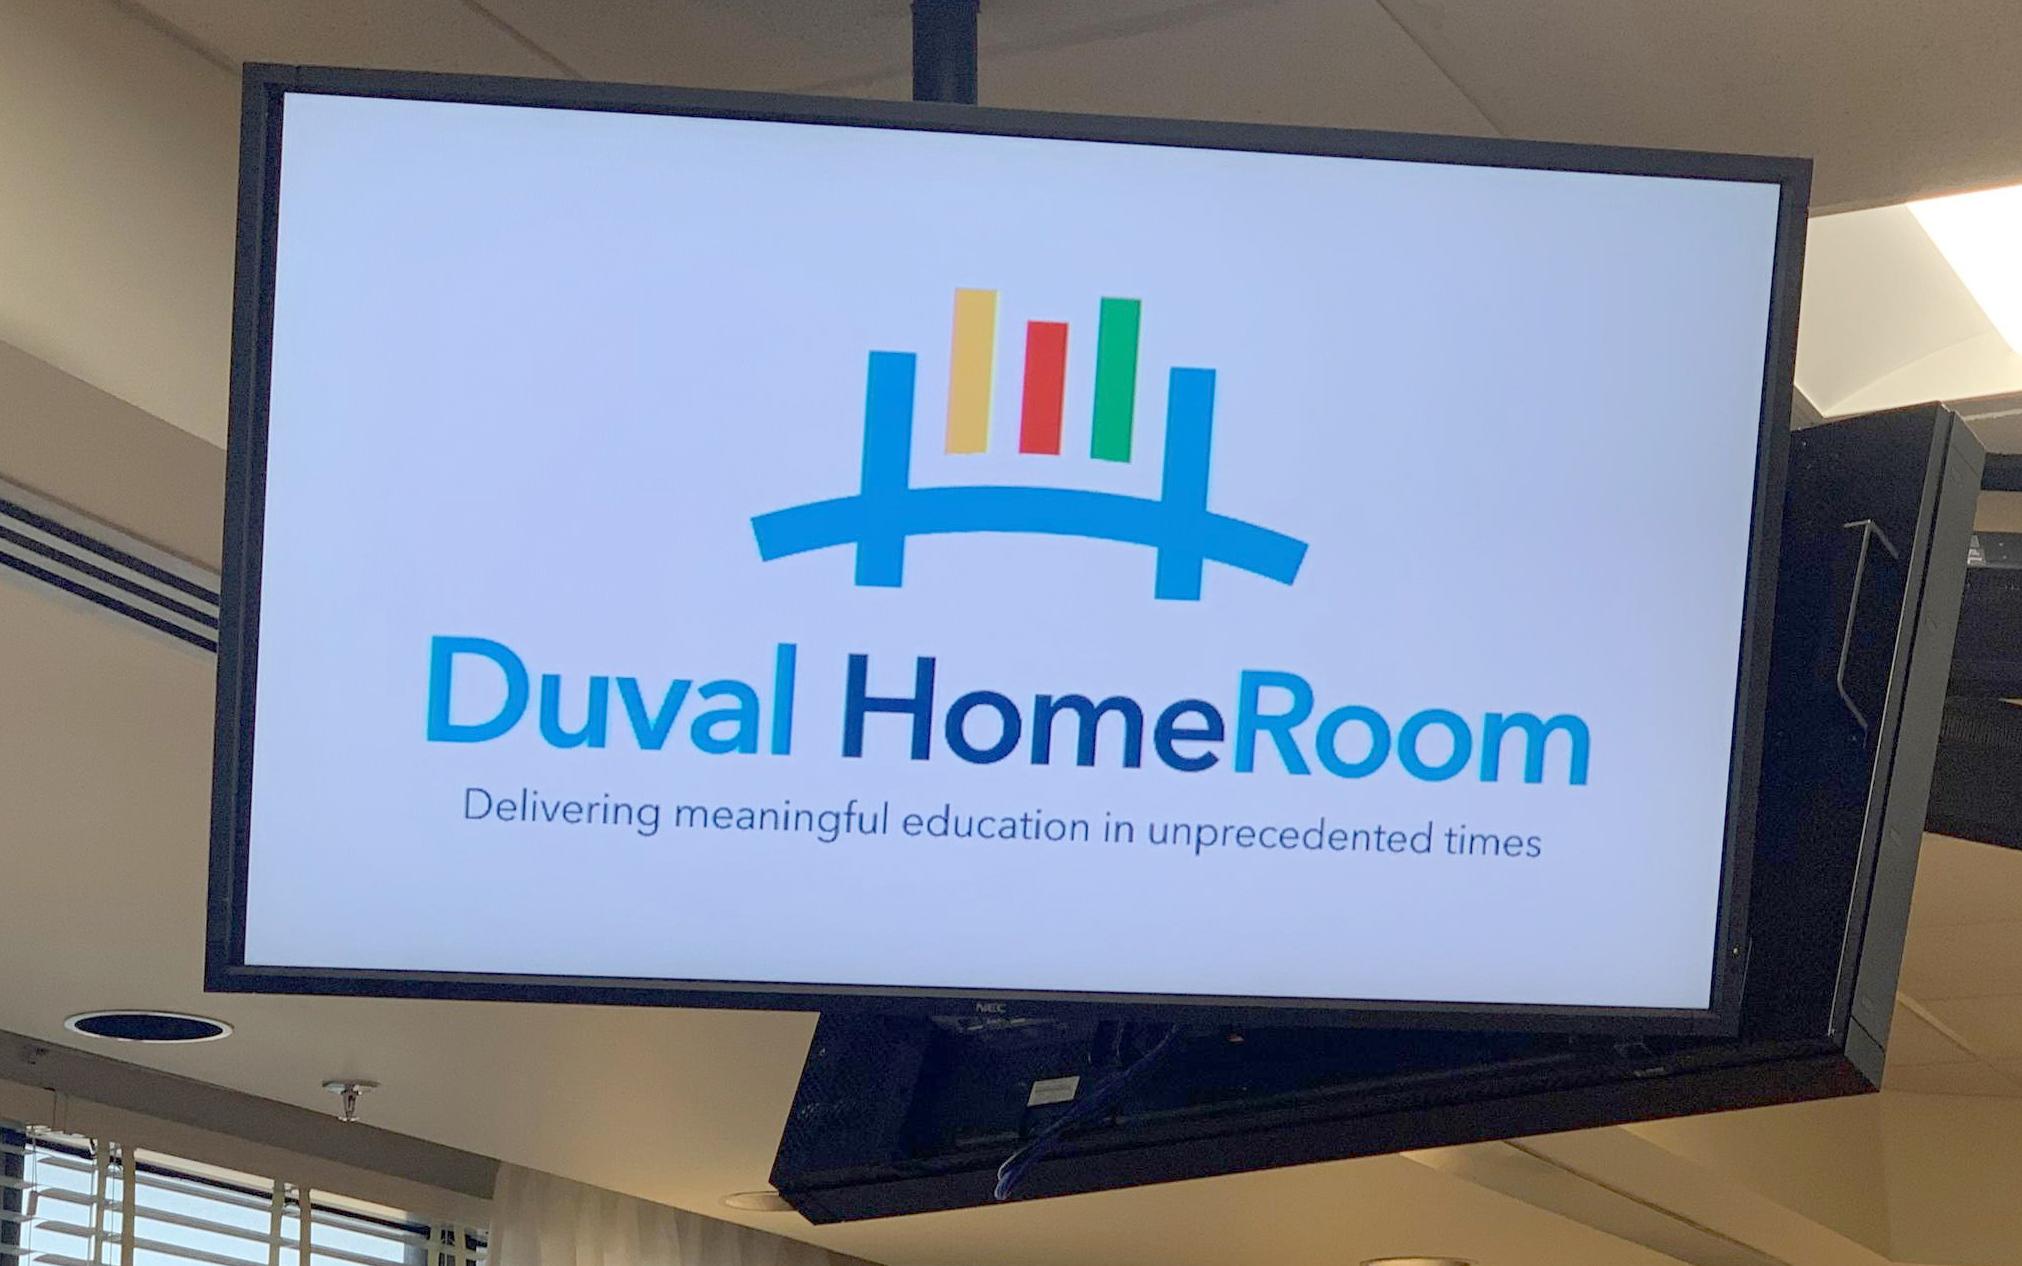 DEVOS can control unlimited digital signage